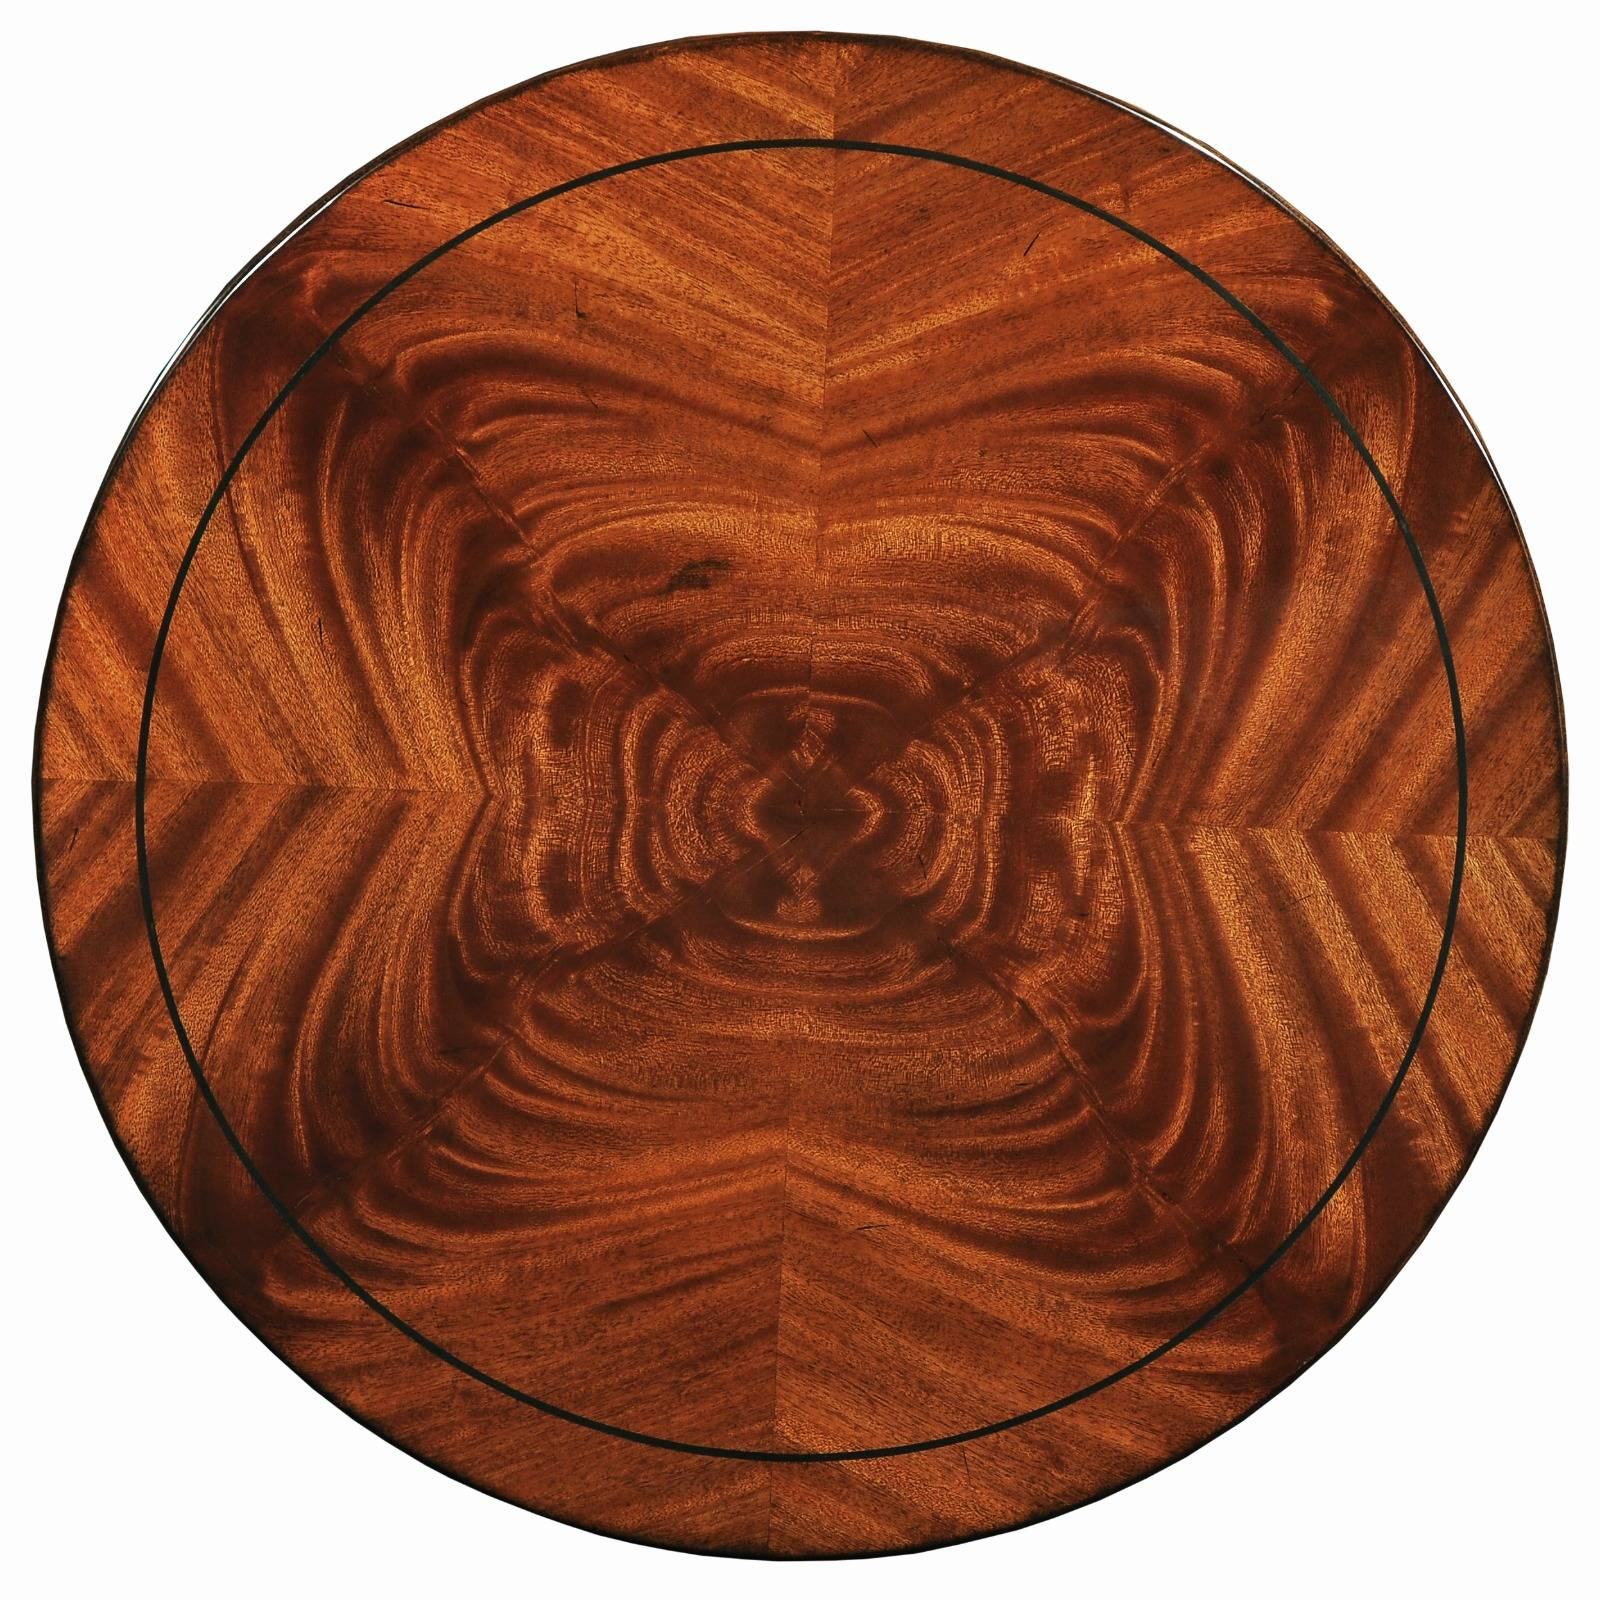 Mauretania wine table - large - In mahogany